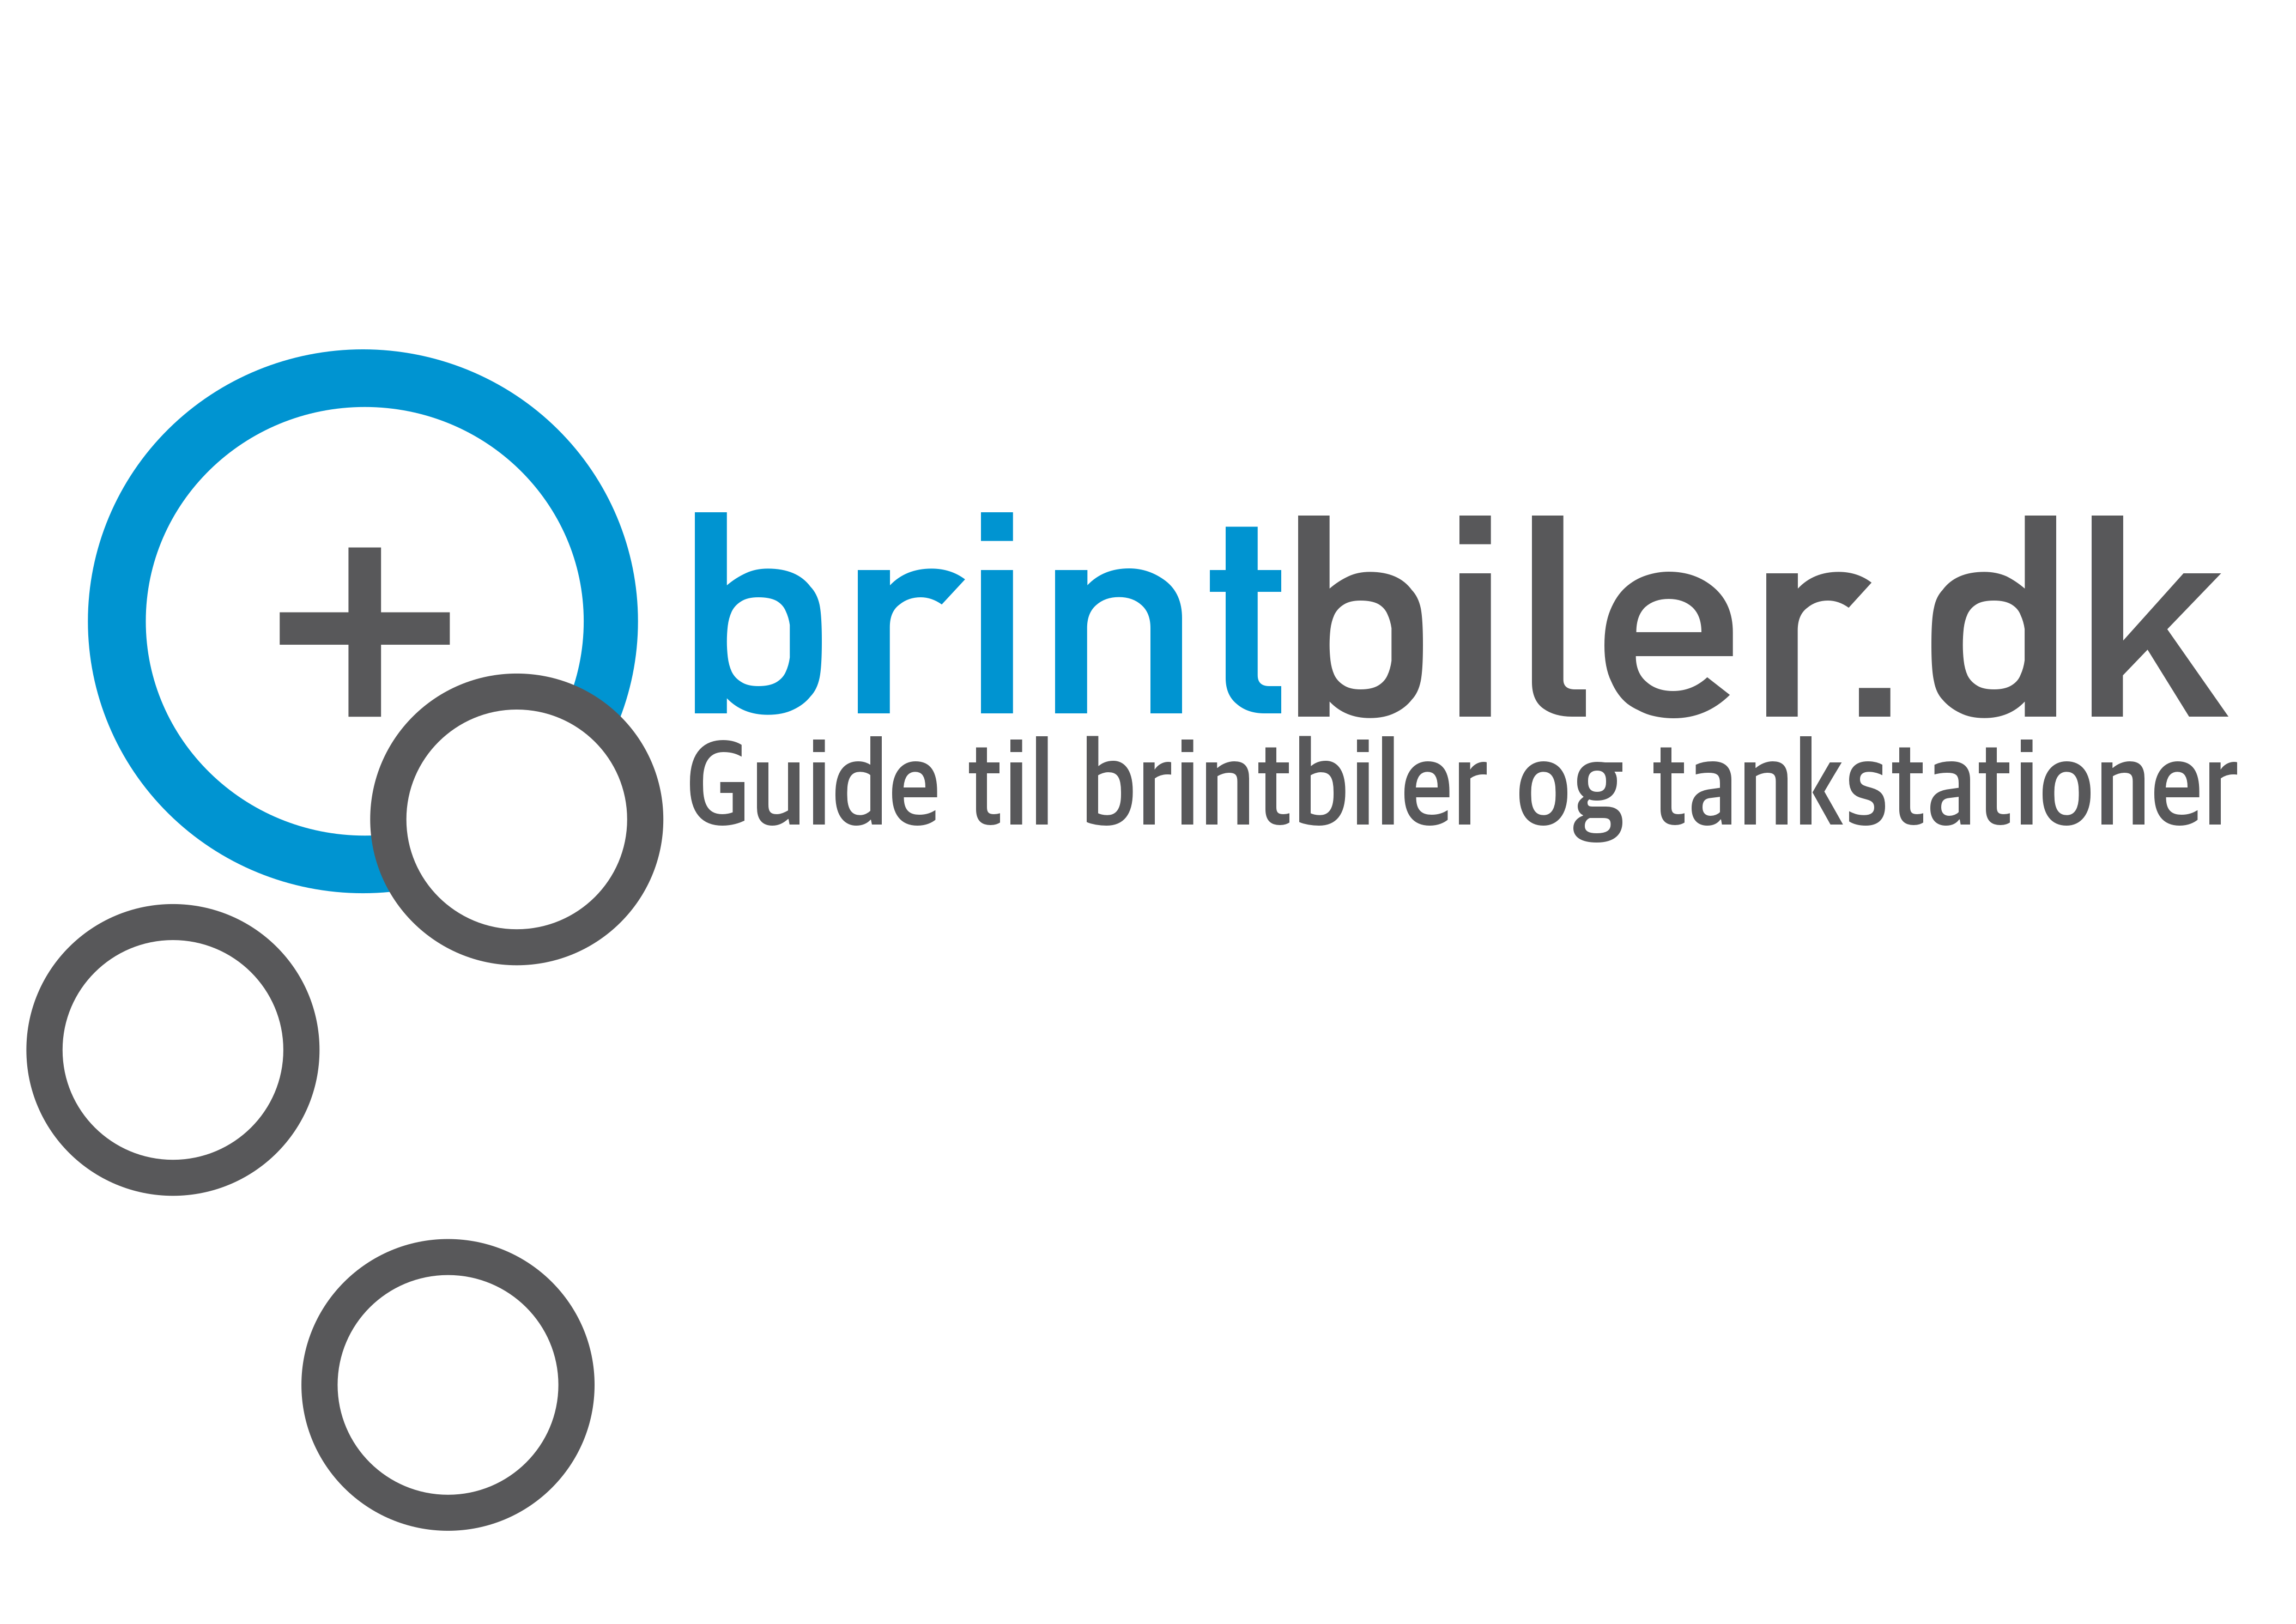 Brintbiler.dk Logo